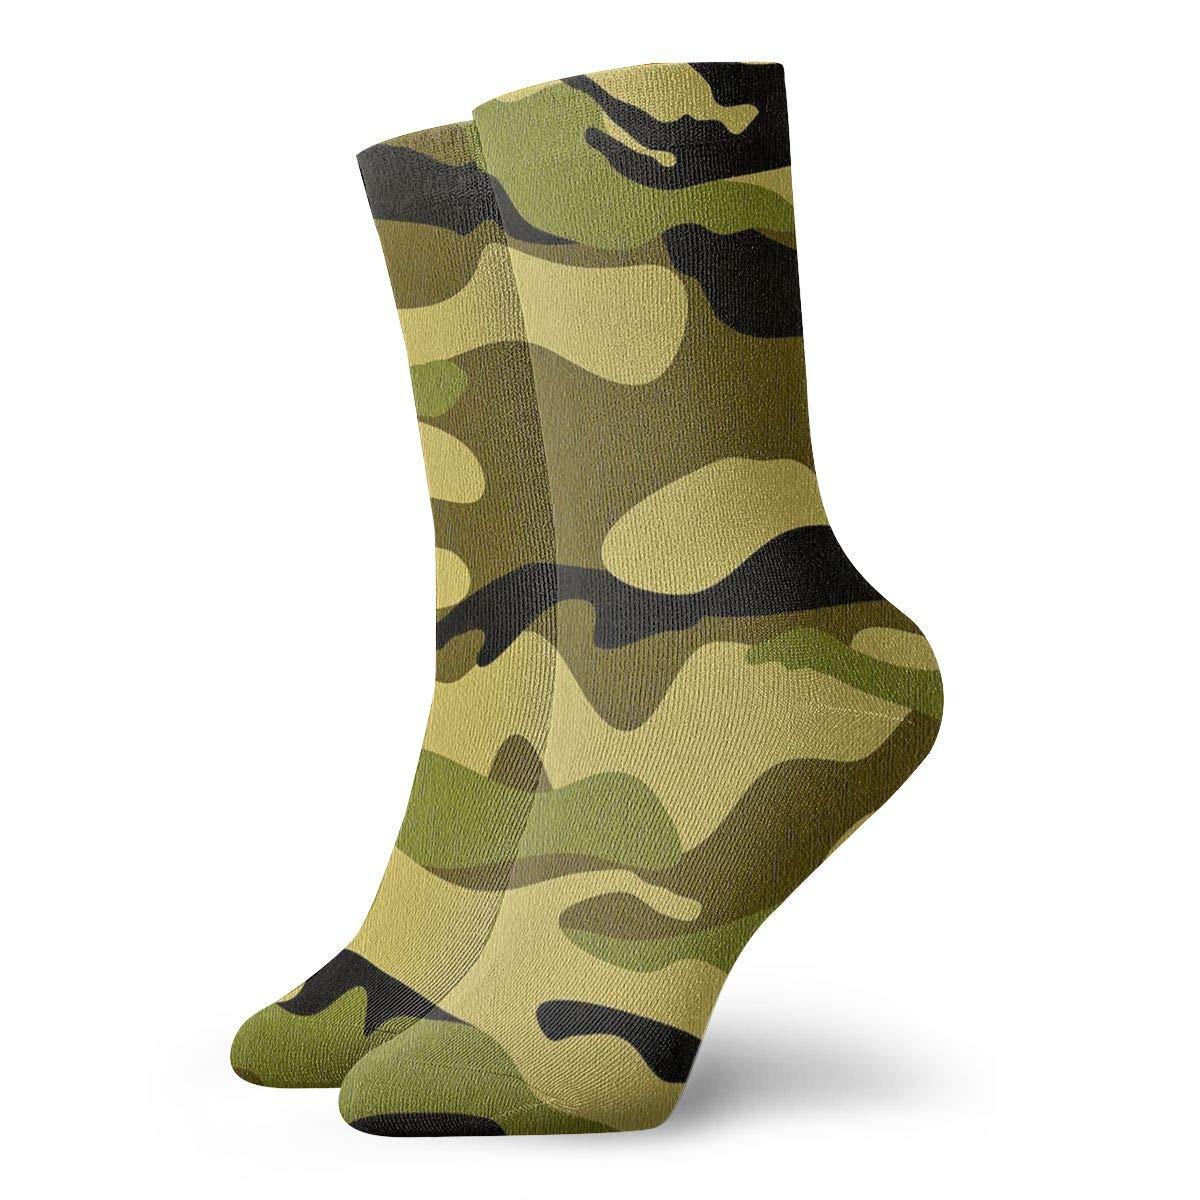 Leopard Unisex Funny Casual Crew Socks Athletic Socks For Boys Girls Kids Teenagers